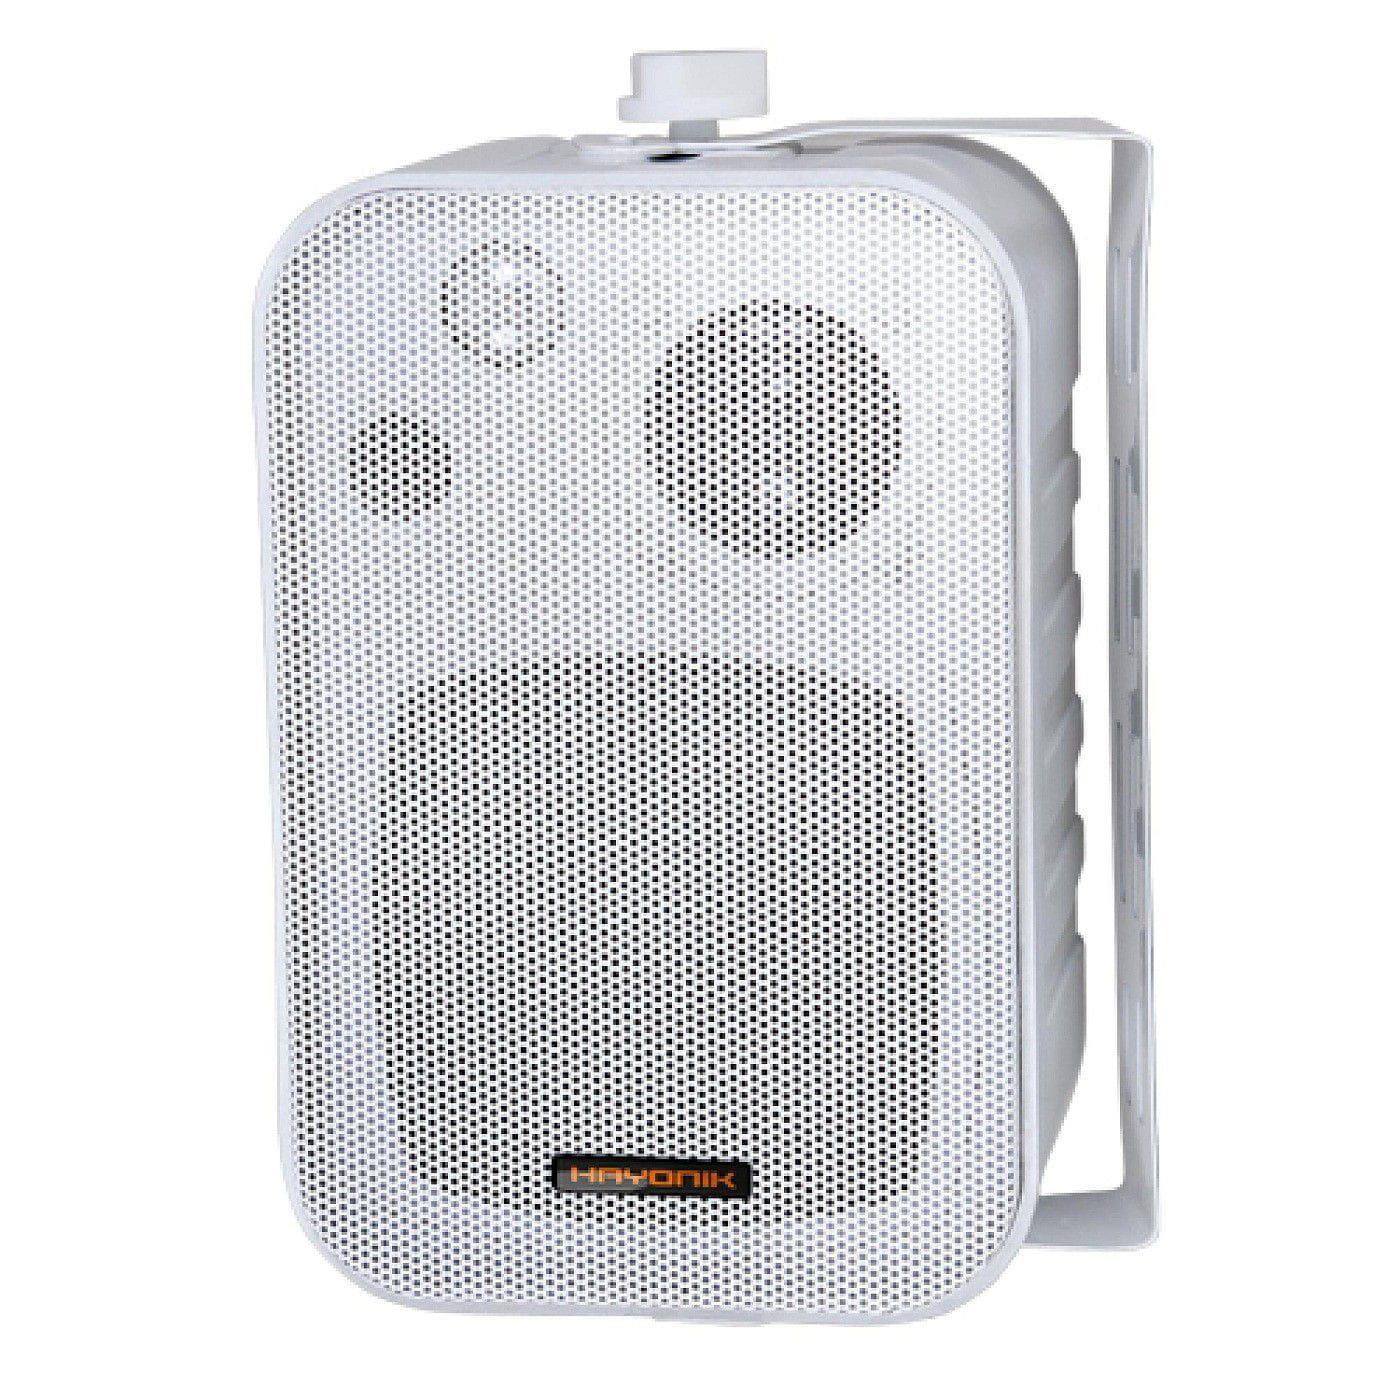 Caixa Acústica para Som Ambiente Hayonik MSB-406W (Par/60w RMS/Branca)